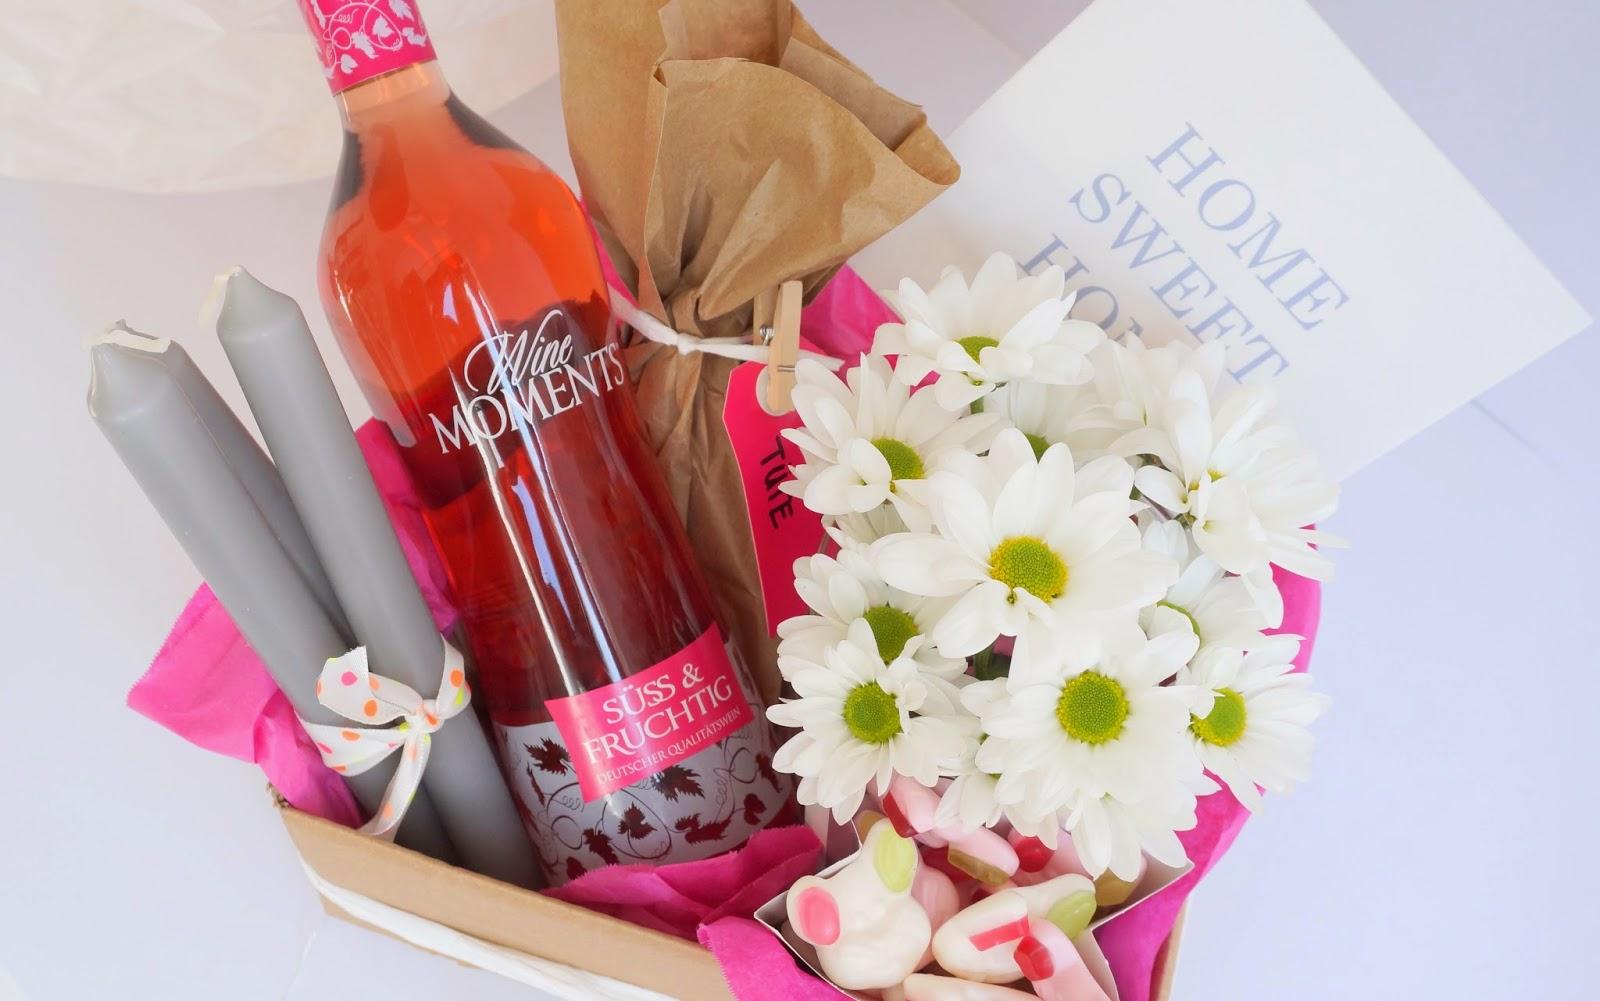 Kühlschrank Rosa : Kleiner kühlschrank rosa smeg kuhlschrank gunstig excellent smeg